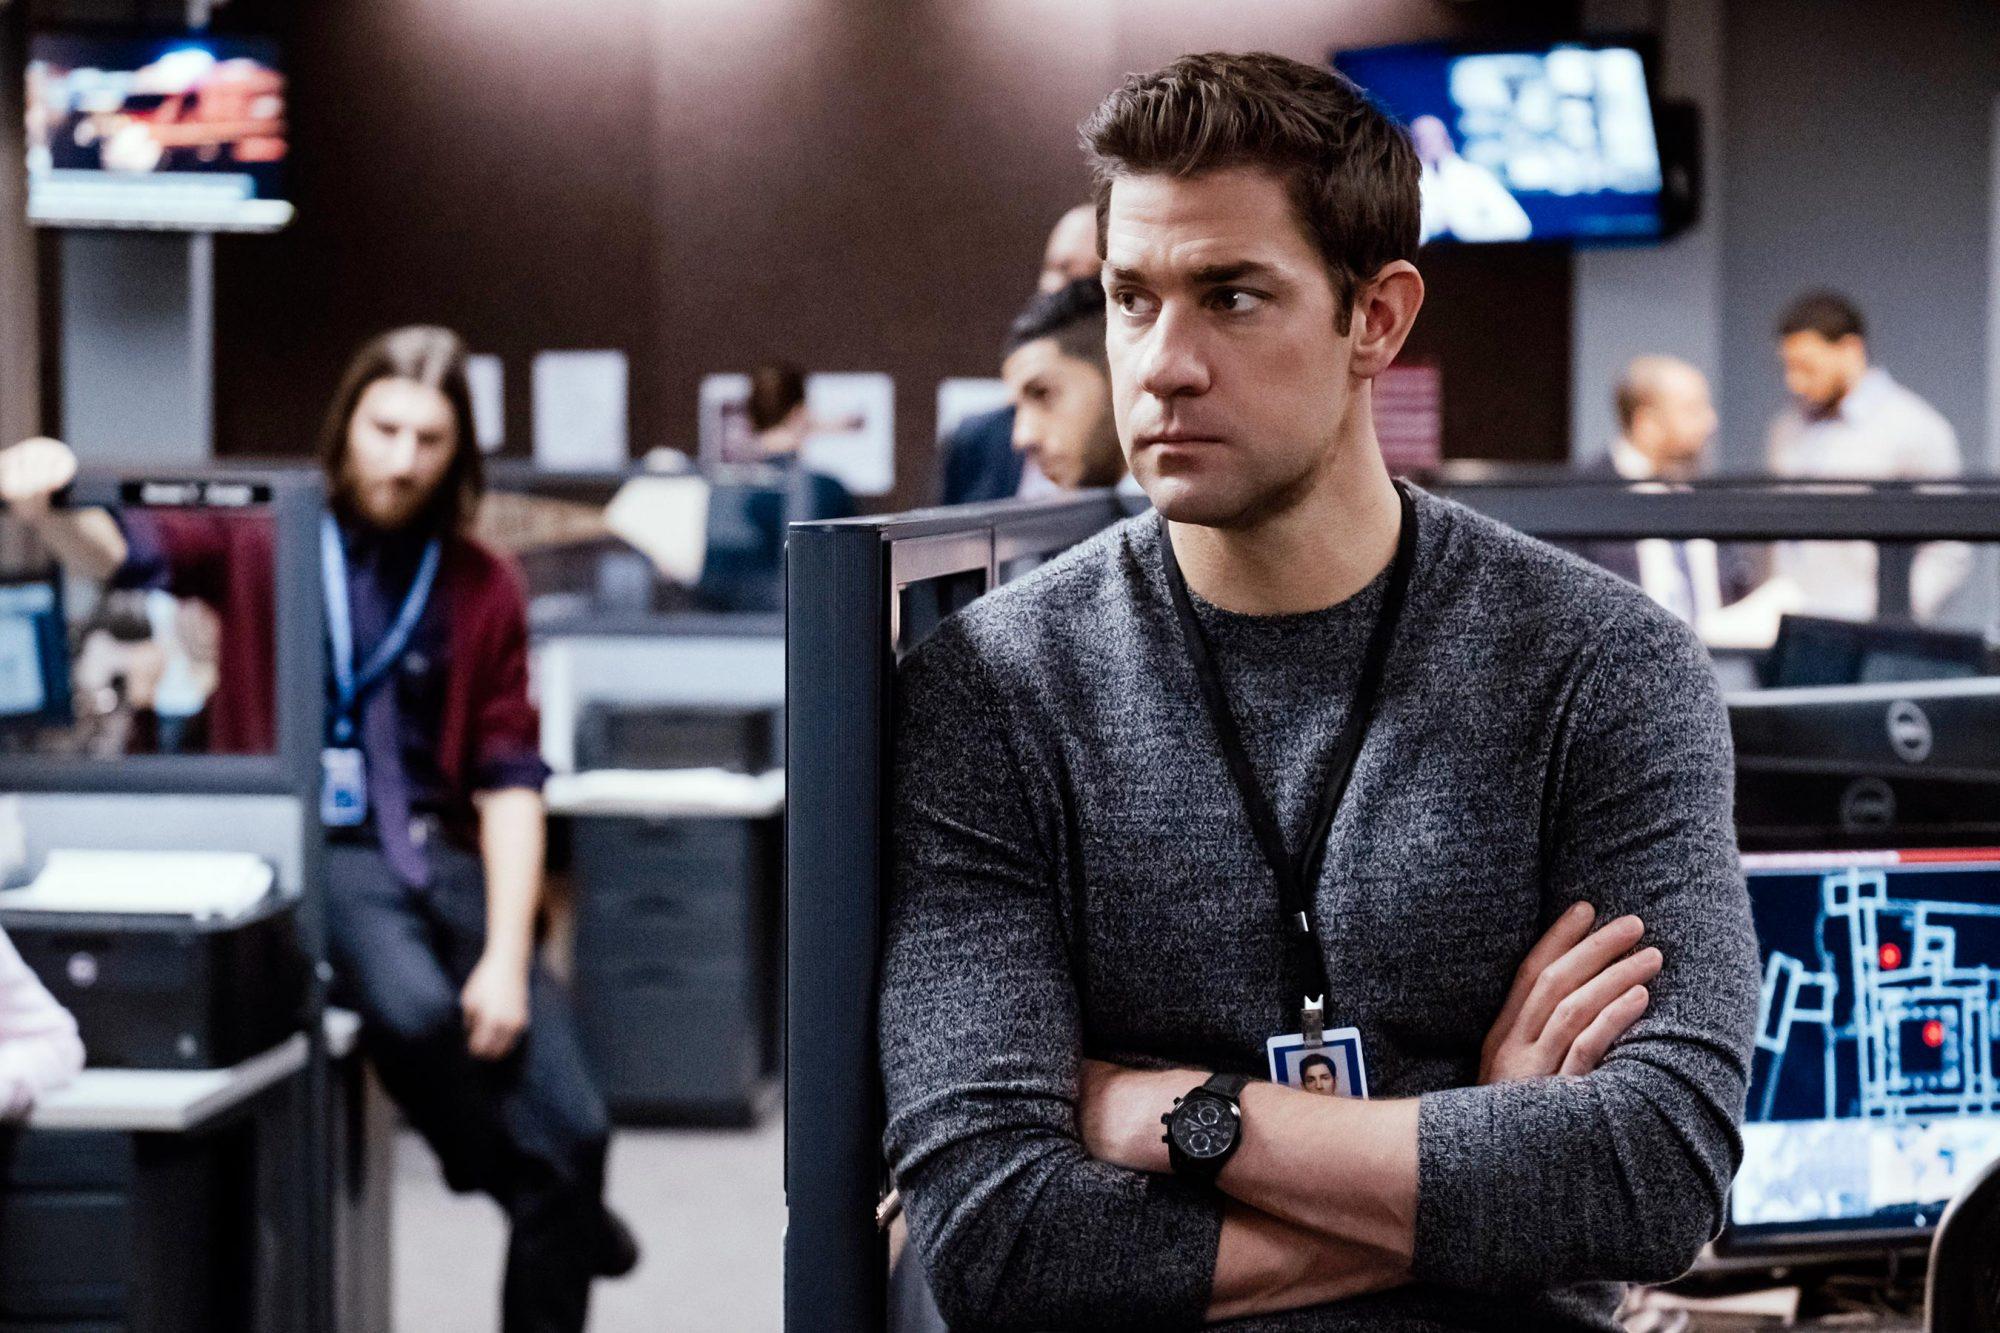 Tom Clancy's Jack RyanSeason 1, Episode 8John Krasinski